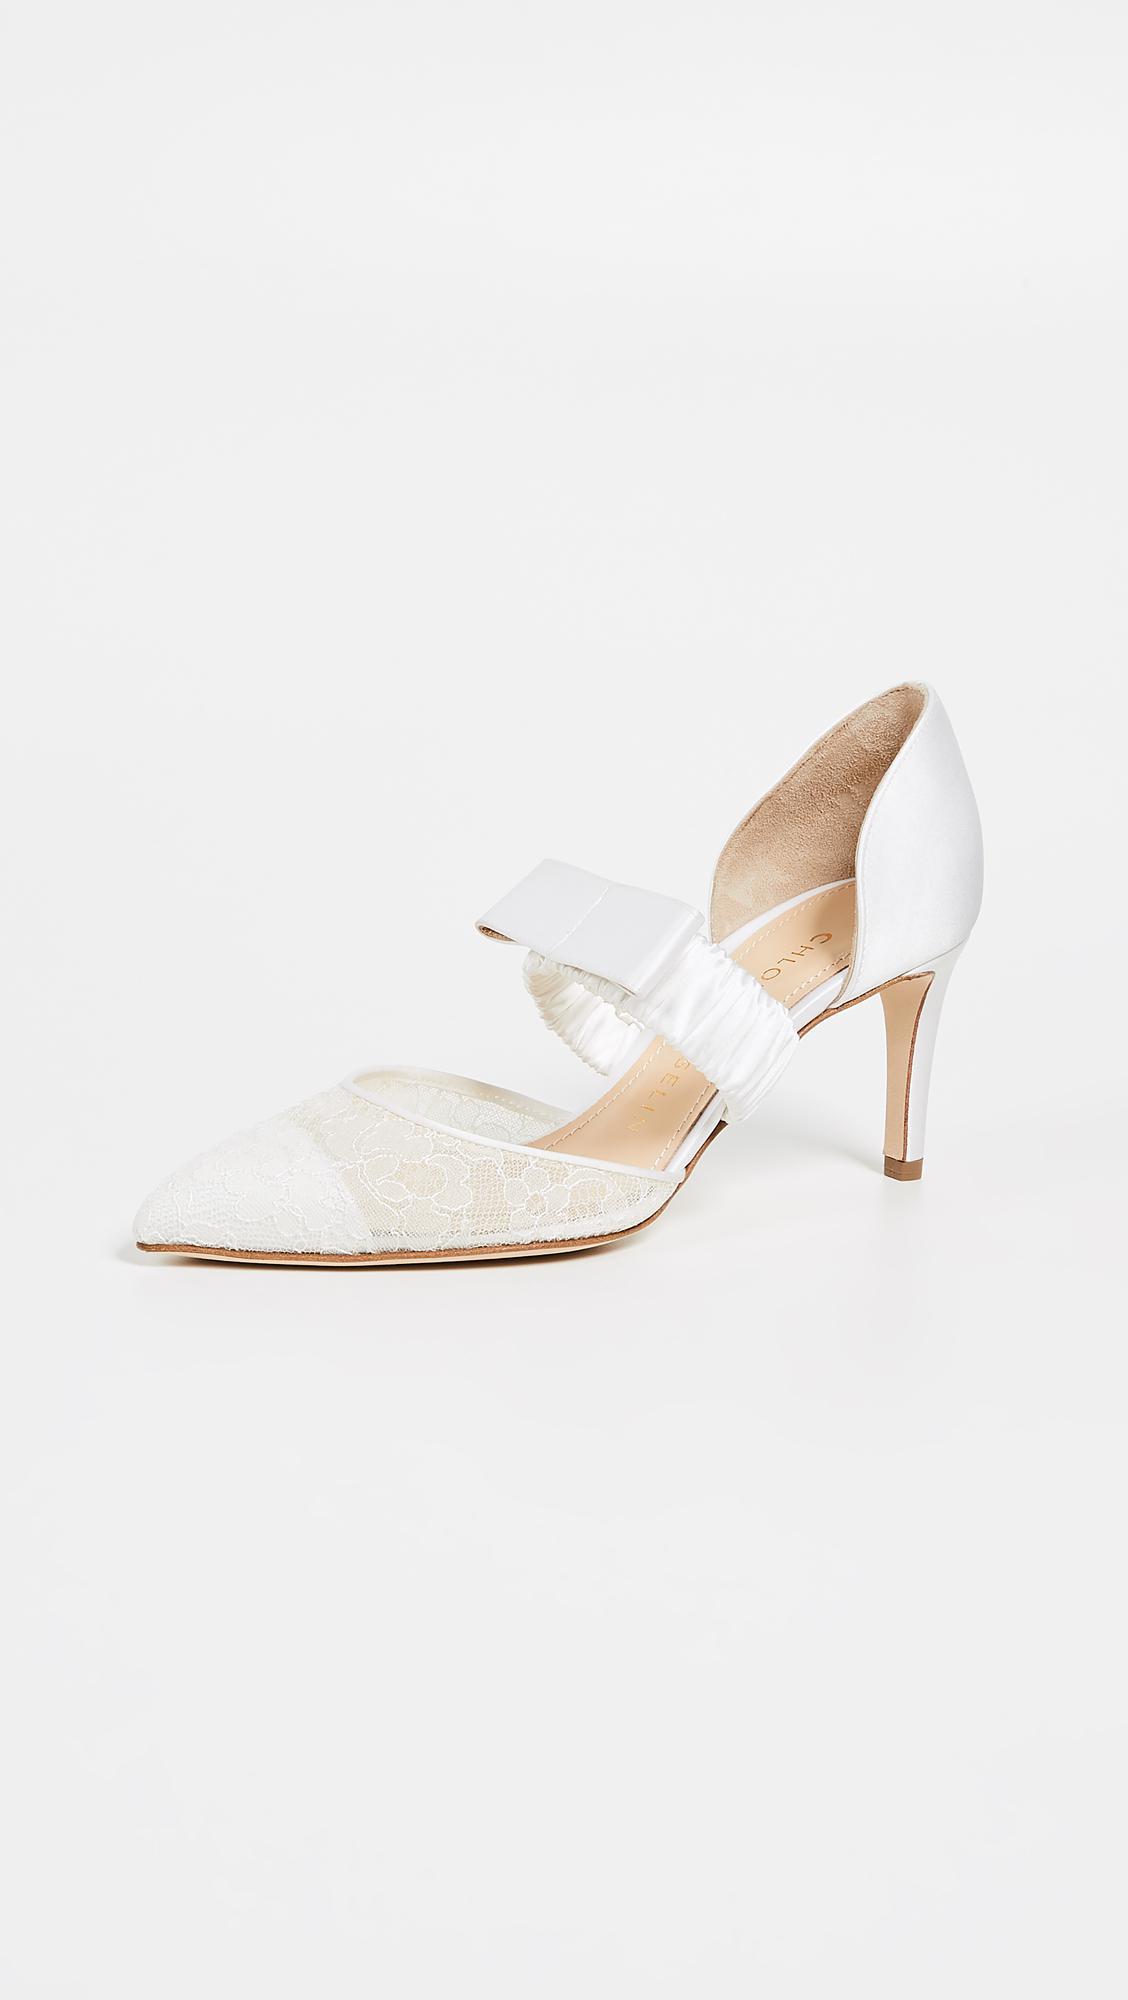 e14b0504e163a9 Chloe Gosselin. Women s White Lily 70 Lace Court Shoes. £632 From Shopbop